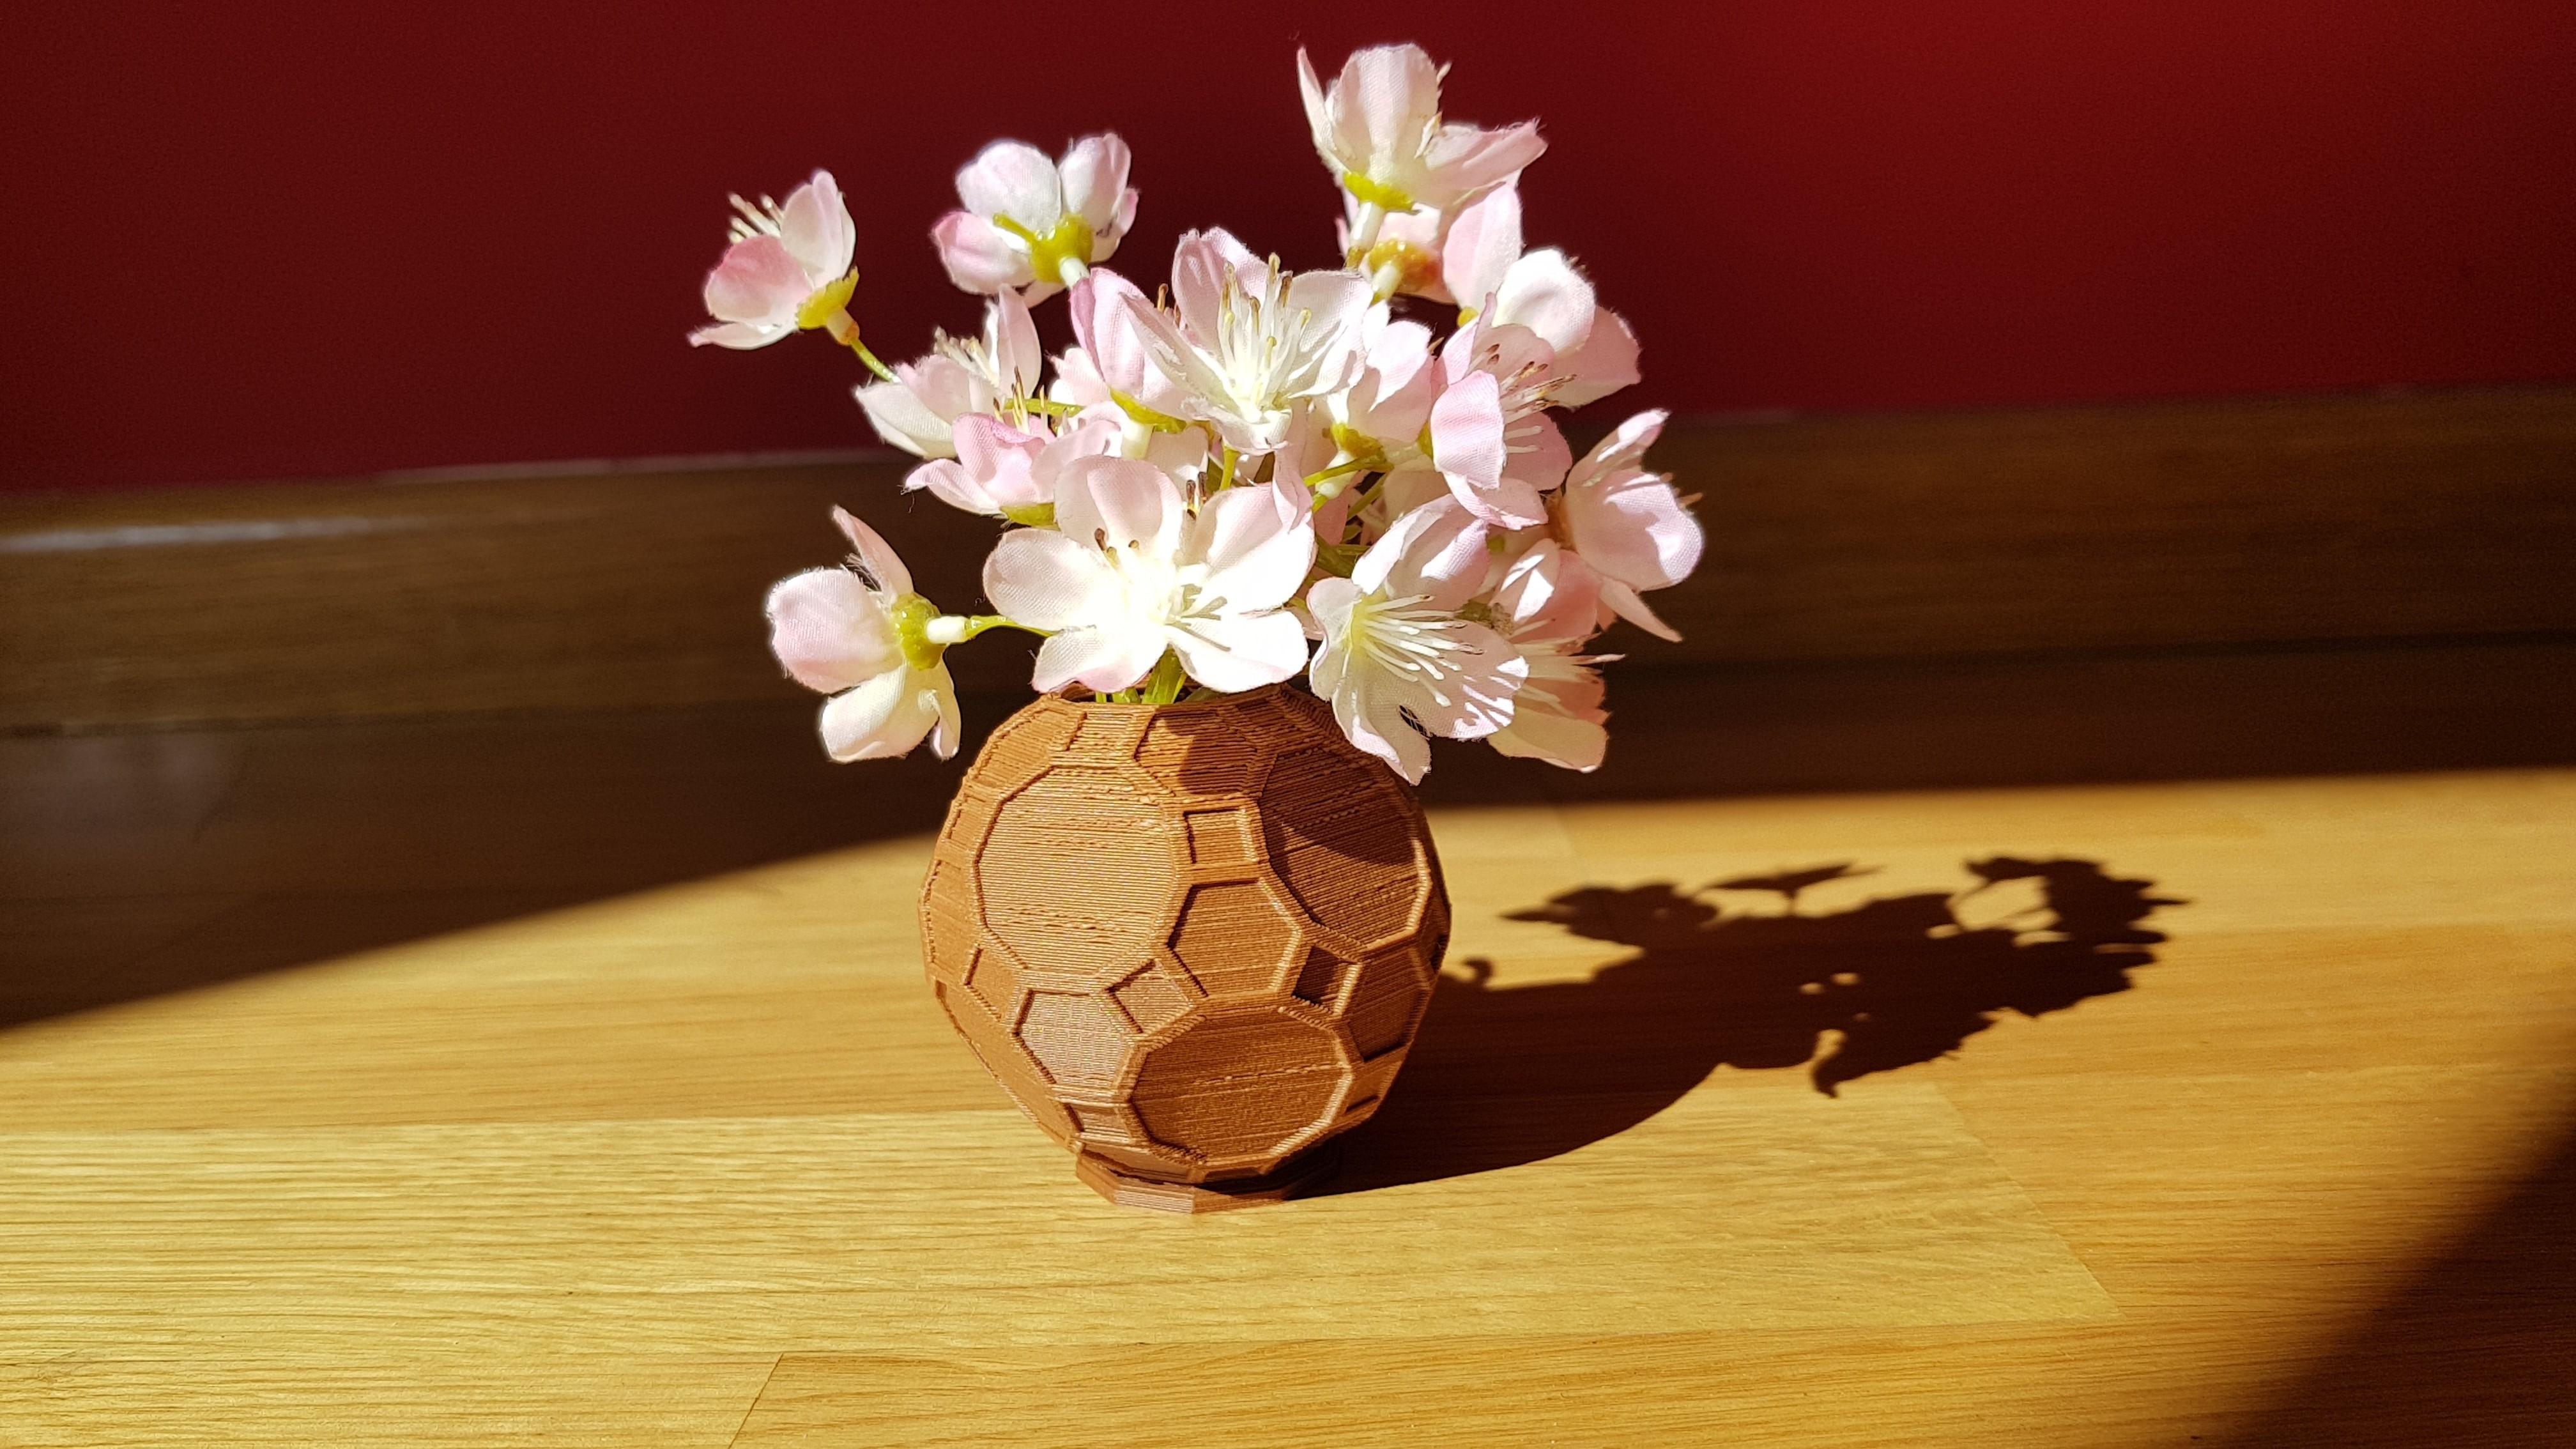 20180312_110446.jpg Download free STL file Geometric mini planter • 3D printable object, solunkejagruti